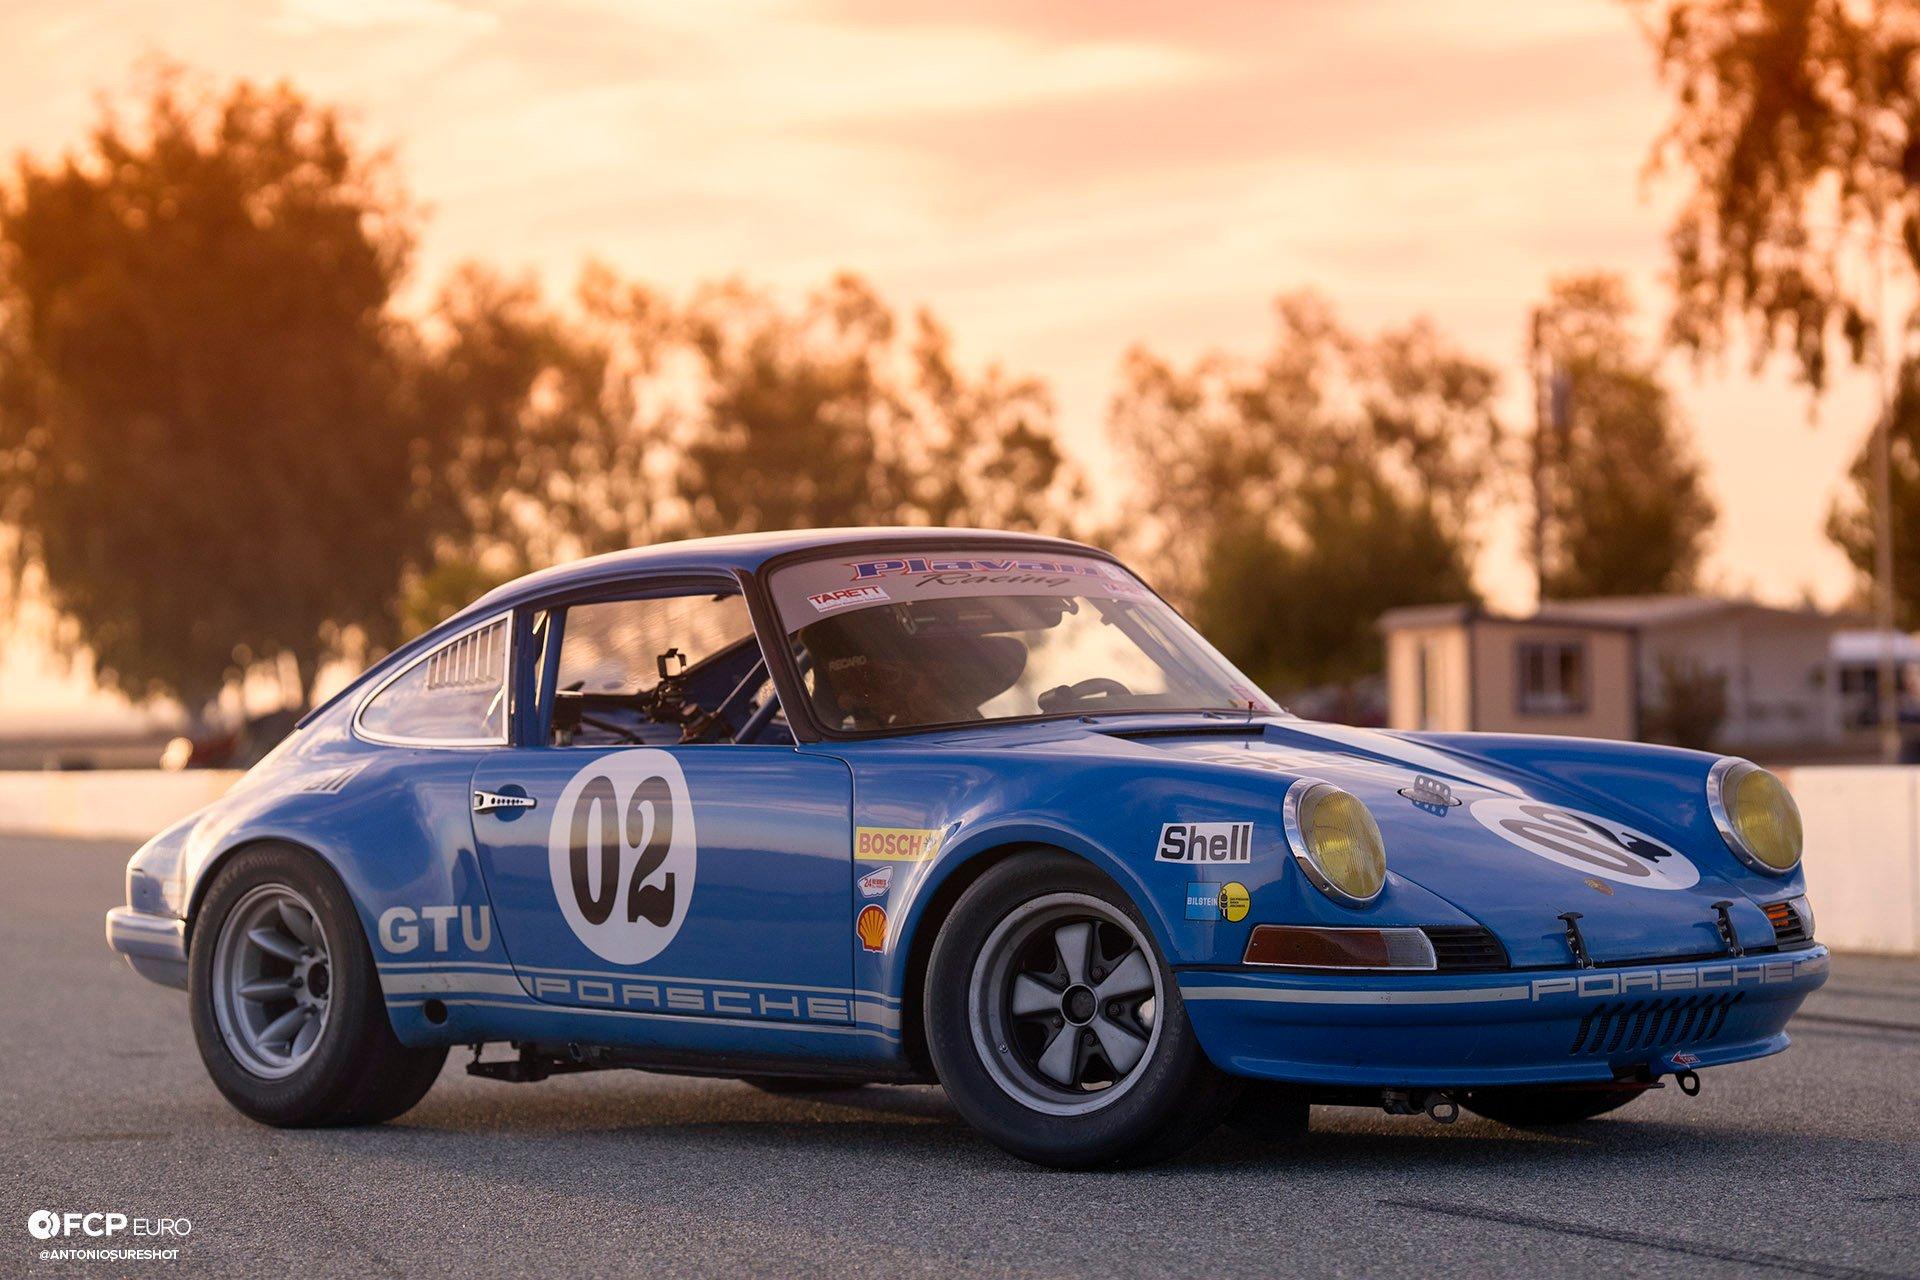 Porsche 911 Longnose VARA Patrick Long Chad Plavan EOSR9413